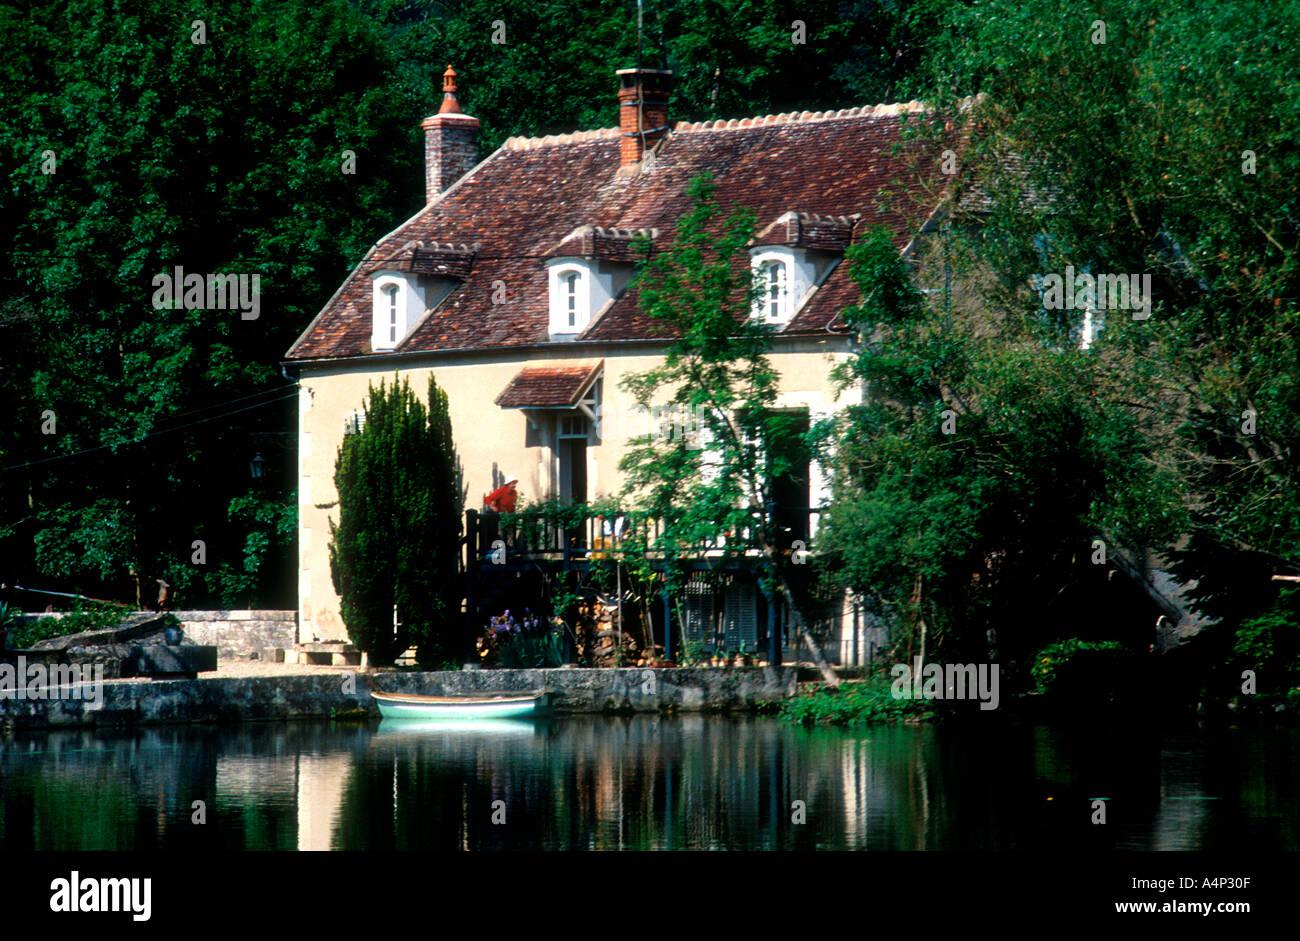 Lock-keepers house Yonne River Nivernais Canal Bourgogne region France - Stock Image